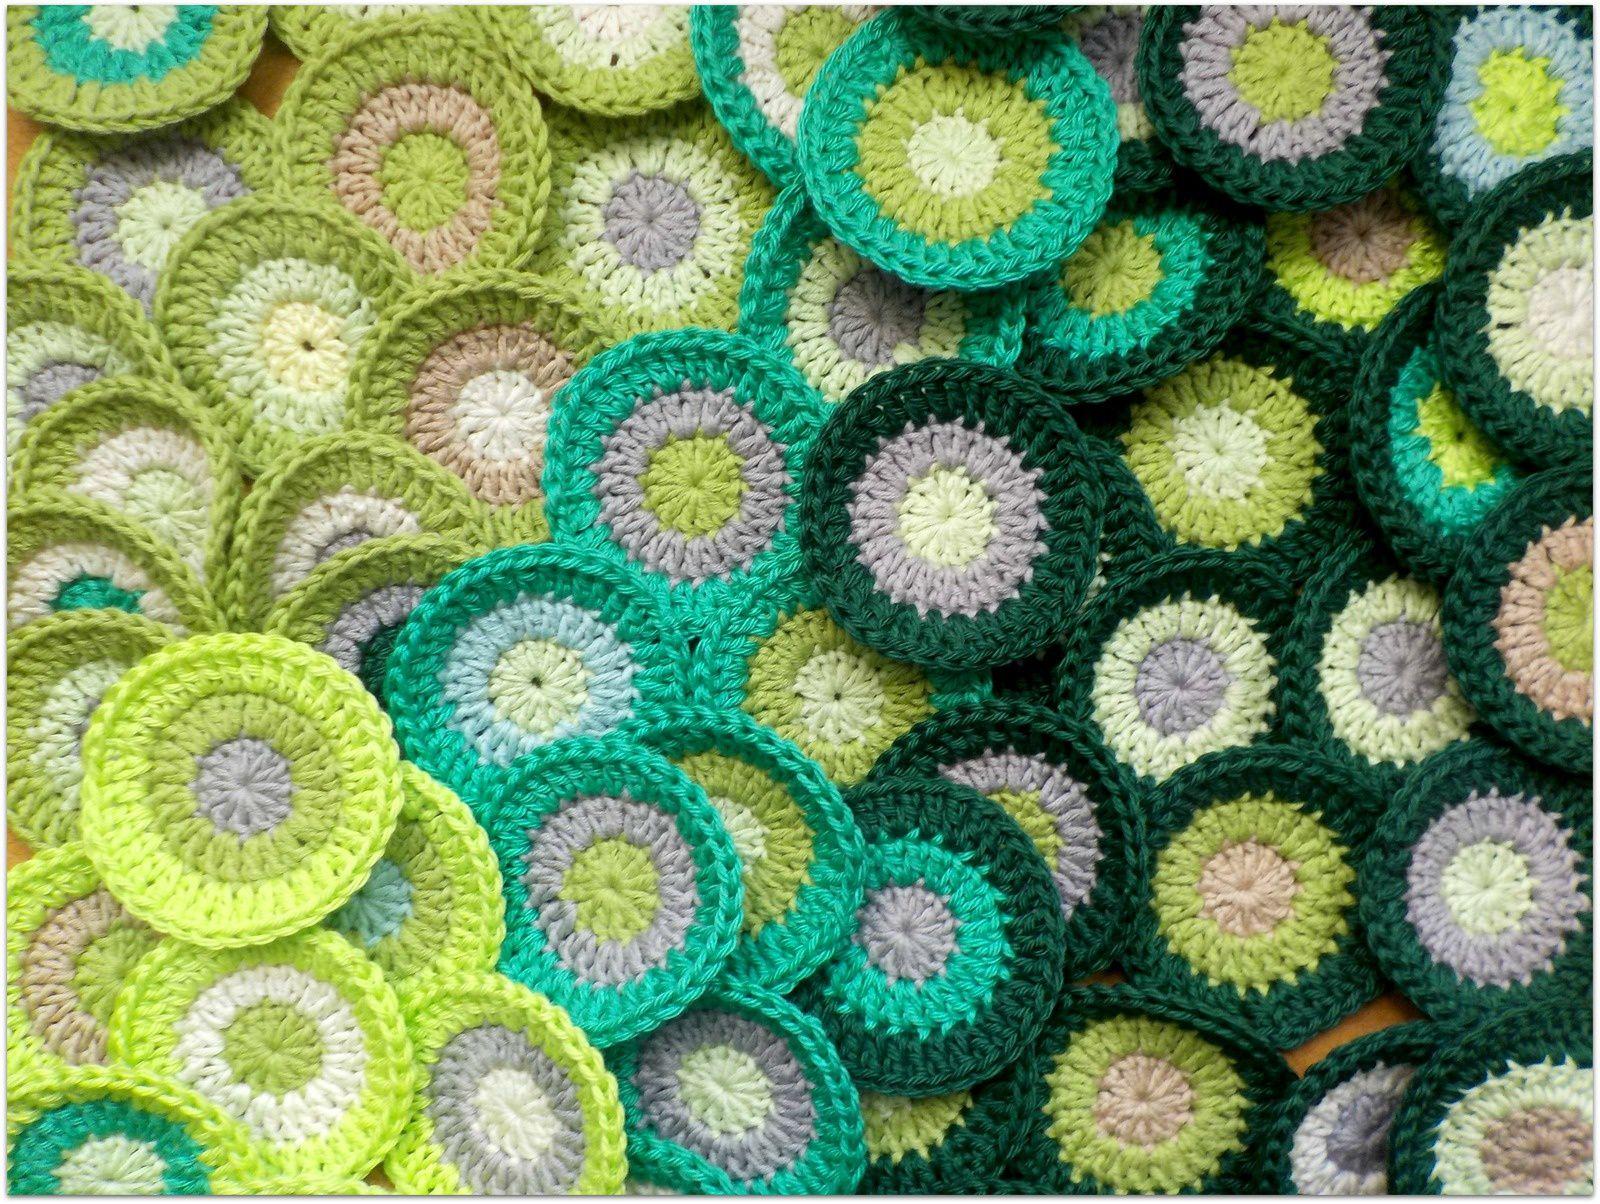 petits ronds verts